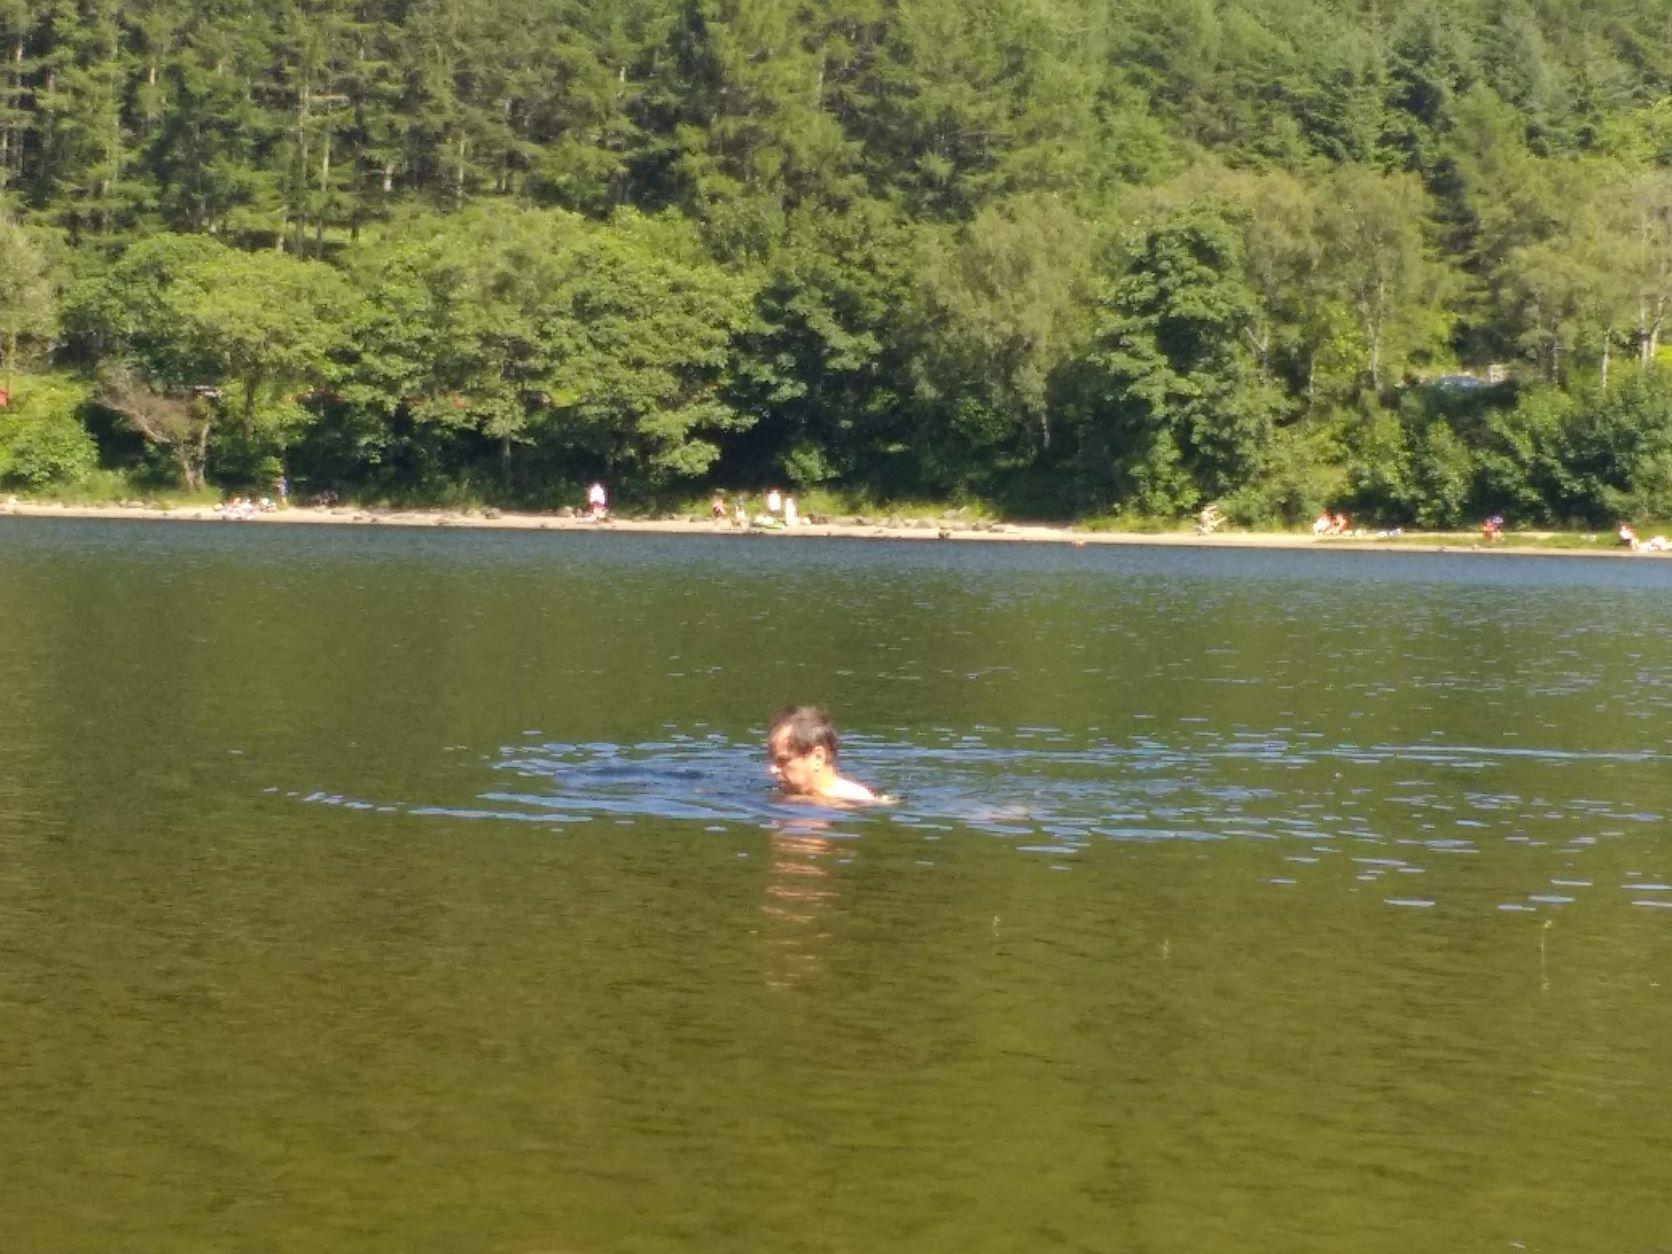 Swimming in Loch Lubnaig